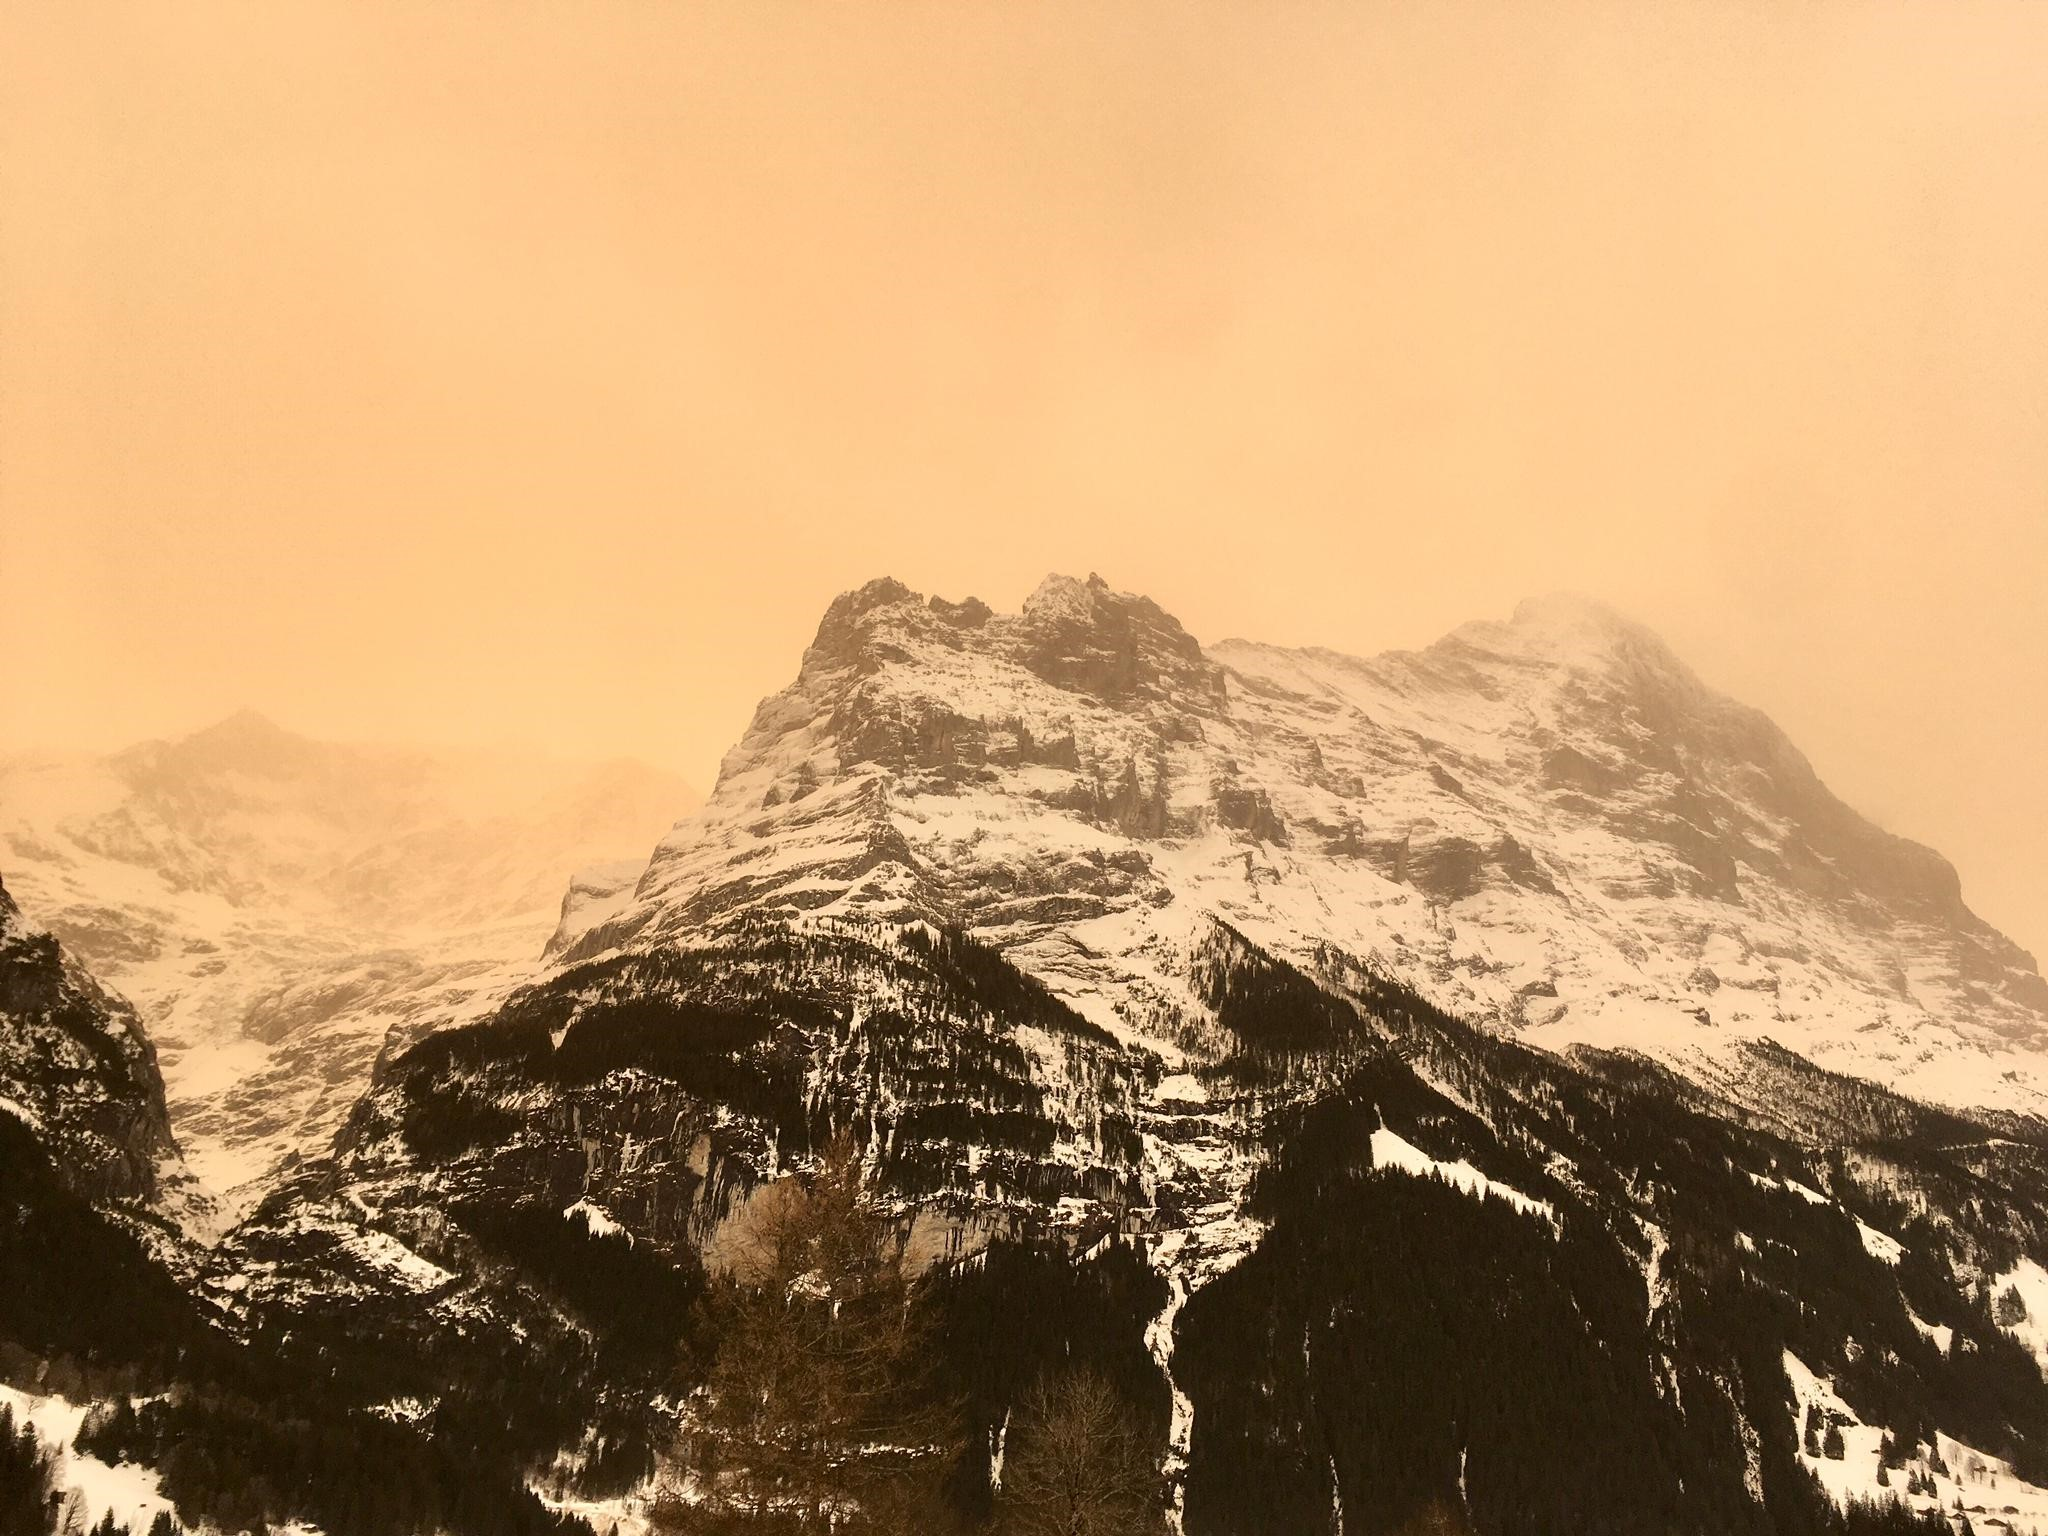 Saharastaub in Grindelwald - Chalet Anemone